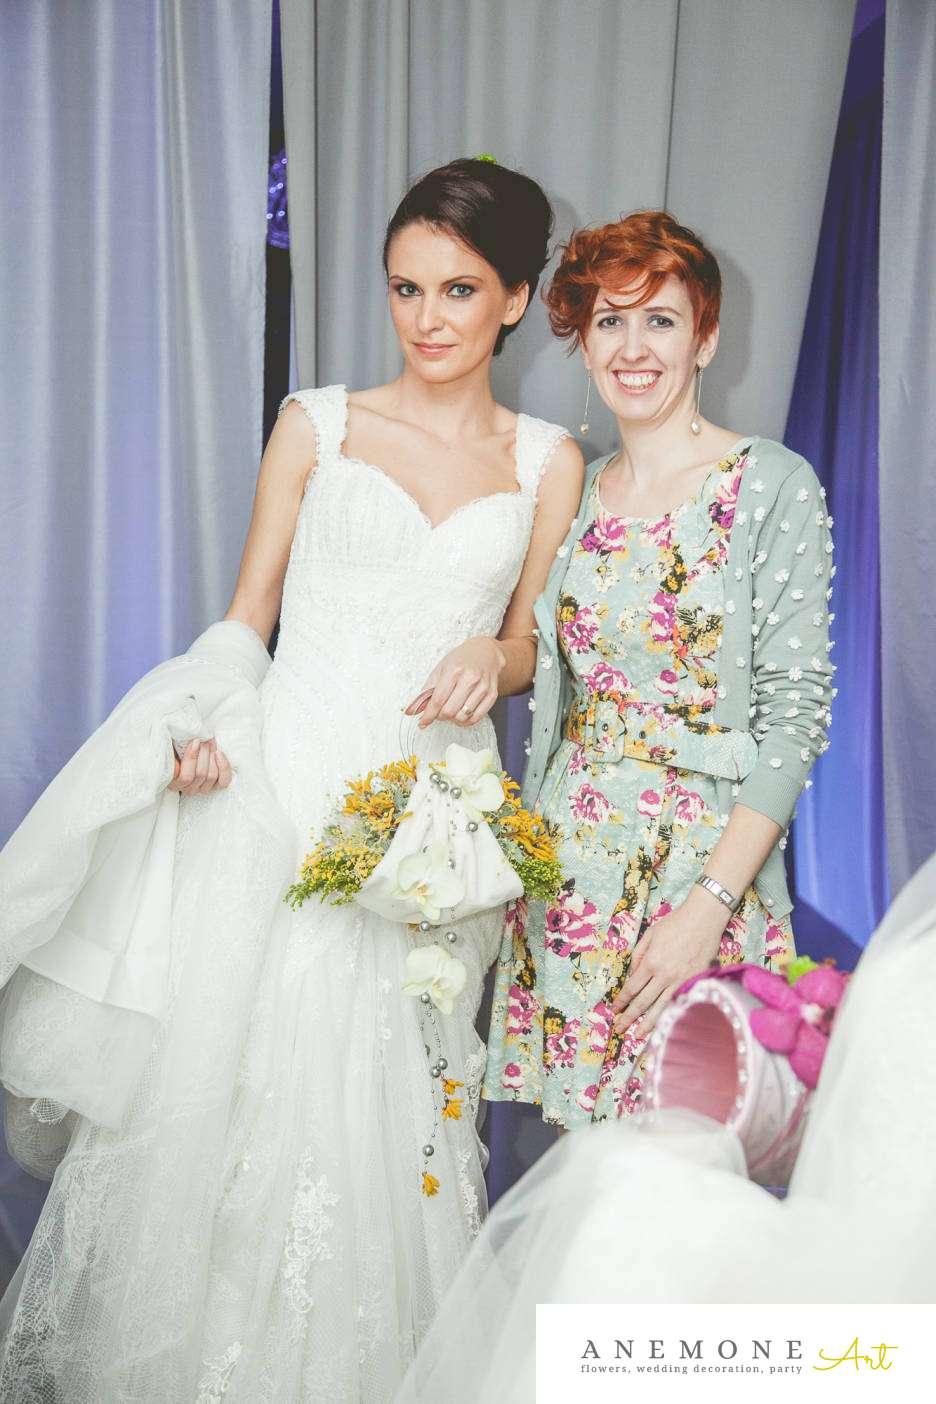 Poza, foto cu Flori de nunta buchet mireasa, galben, poseta in Arad, Timisoara, Oradea (wedding flowers, bouquets) nunta Arad, Timisoara, Oradea